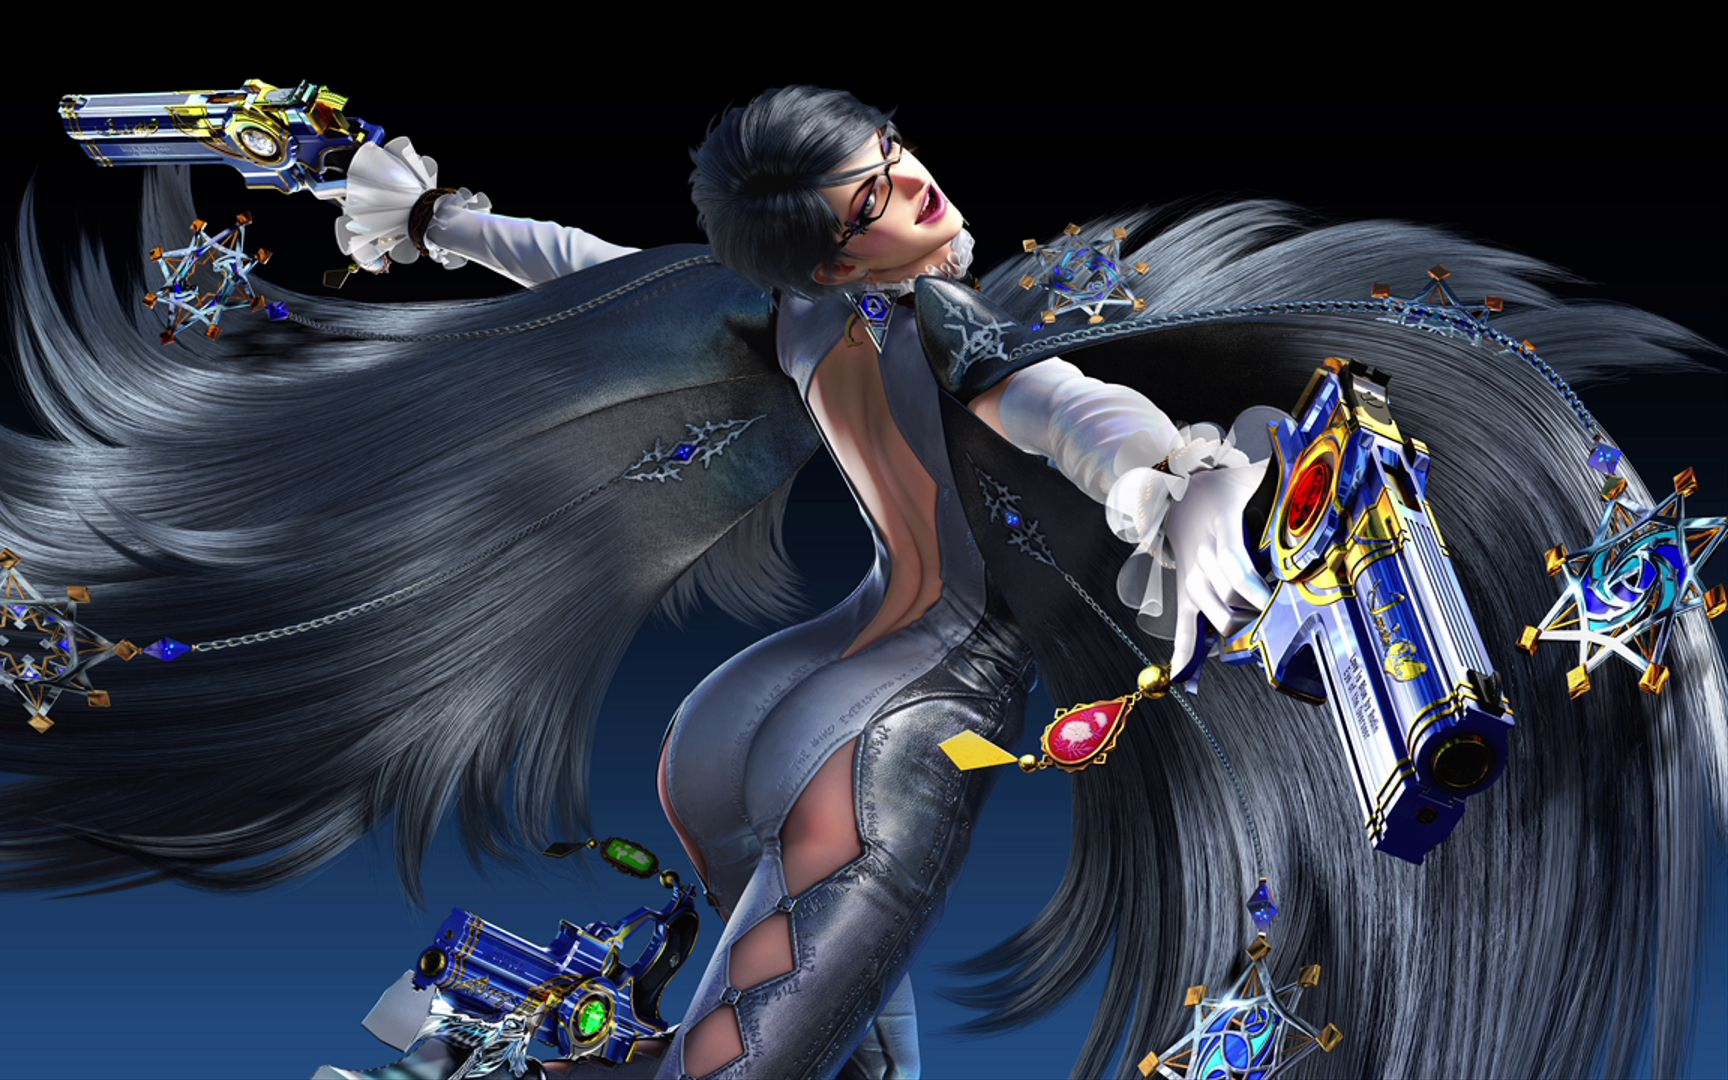 【madao游戏解说】猎天使魔女 pc版 hard难度 - 序章图片